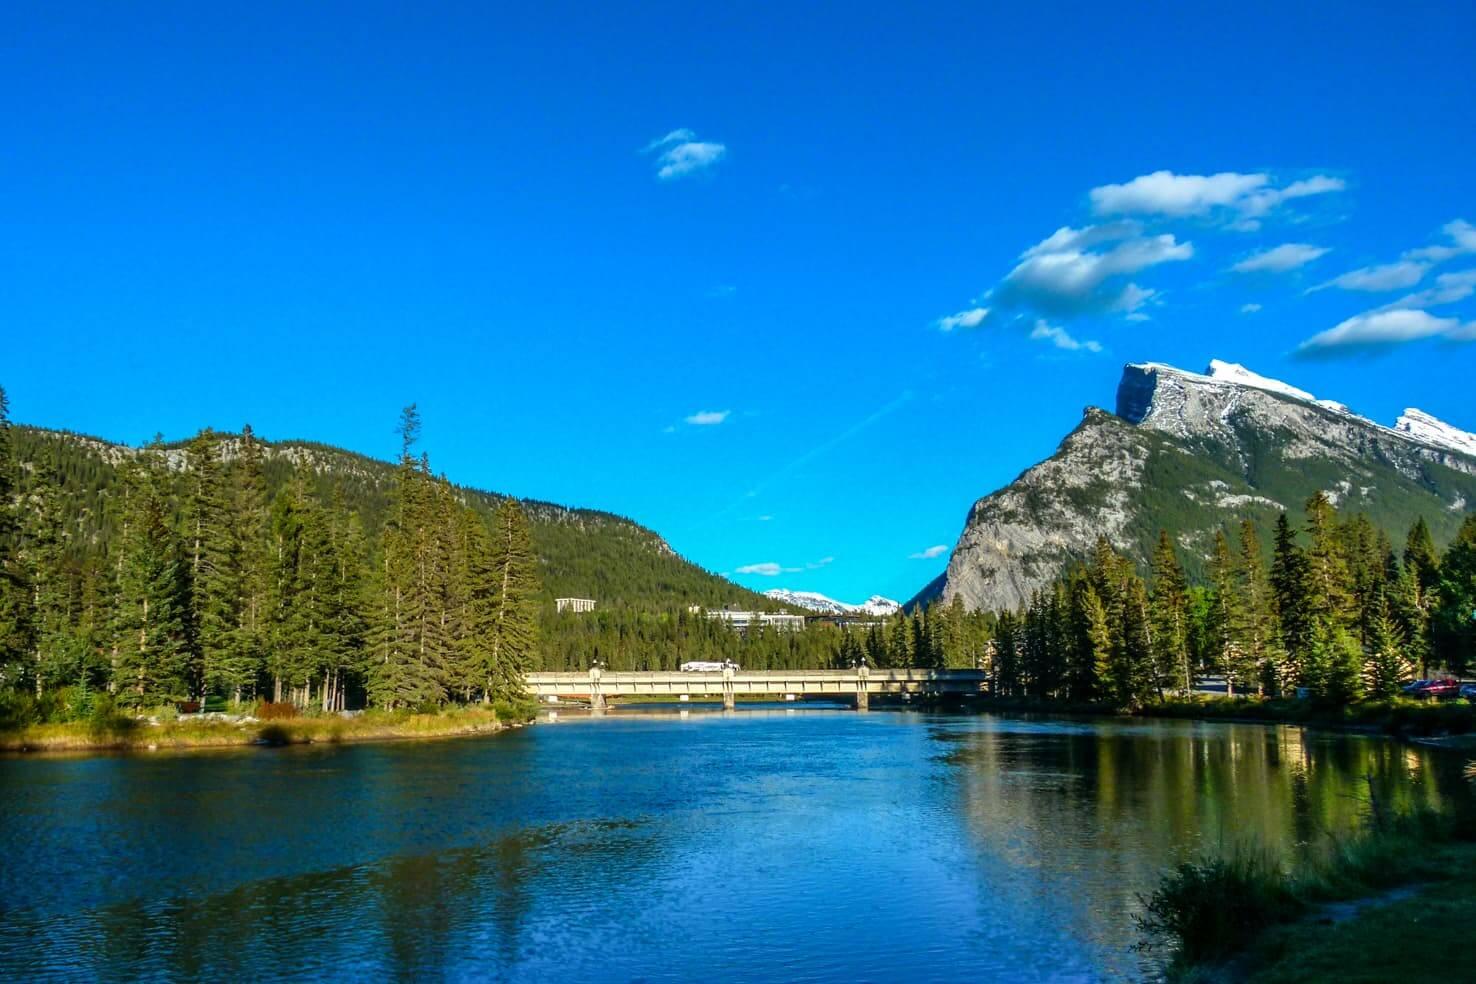 A summer evening at Moraine Lake, Banff National Park